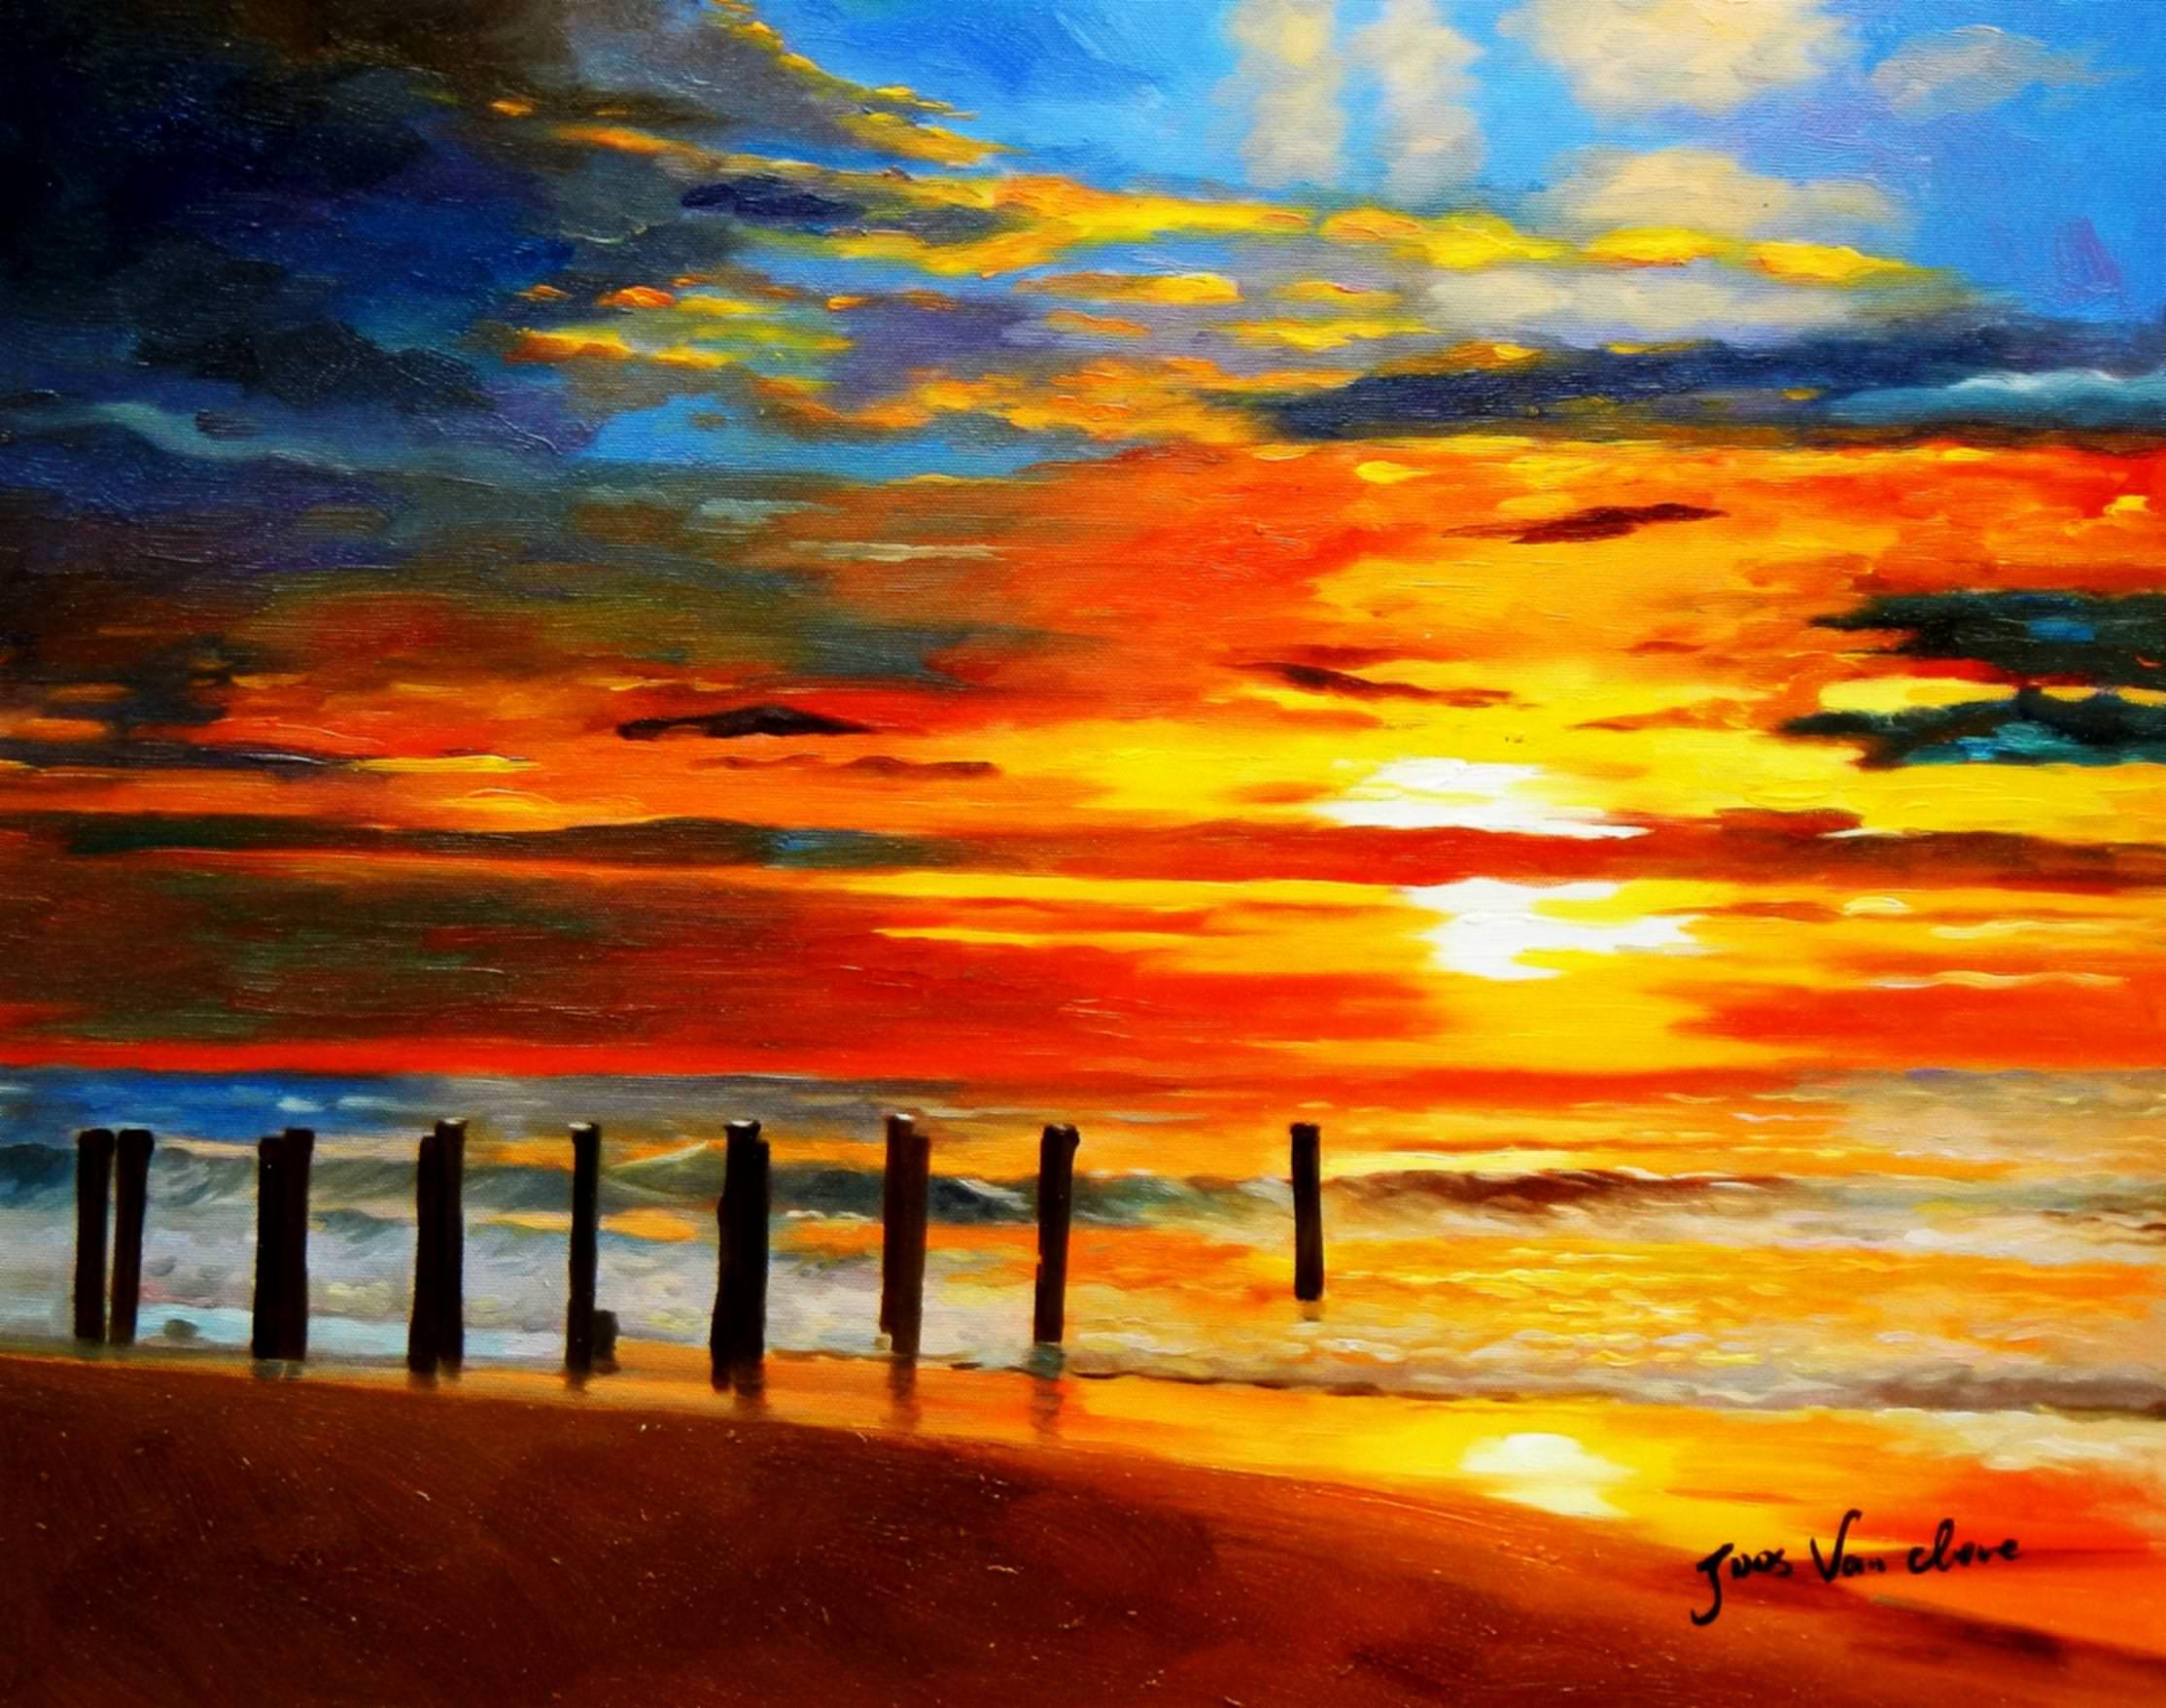 Modern Art - Nordsee Sonnenuntergang b93031 40x50cm handgemaltes Ölbild